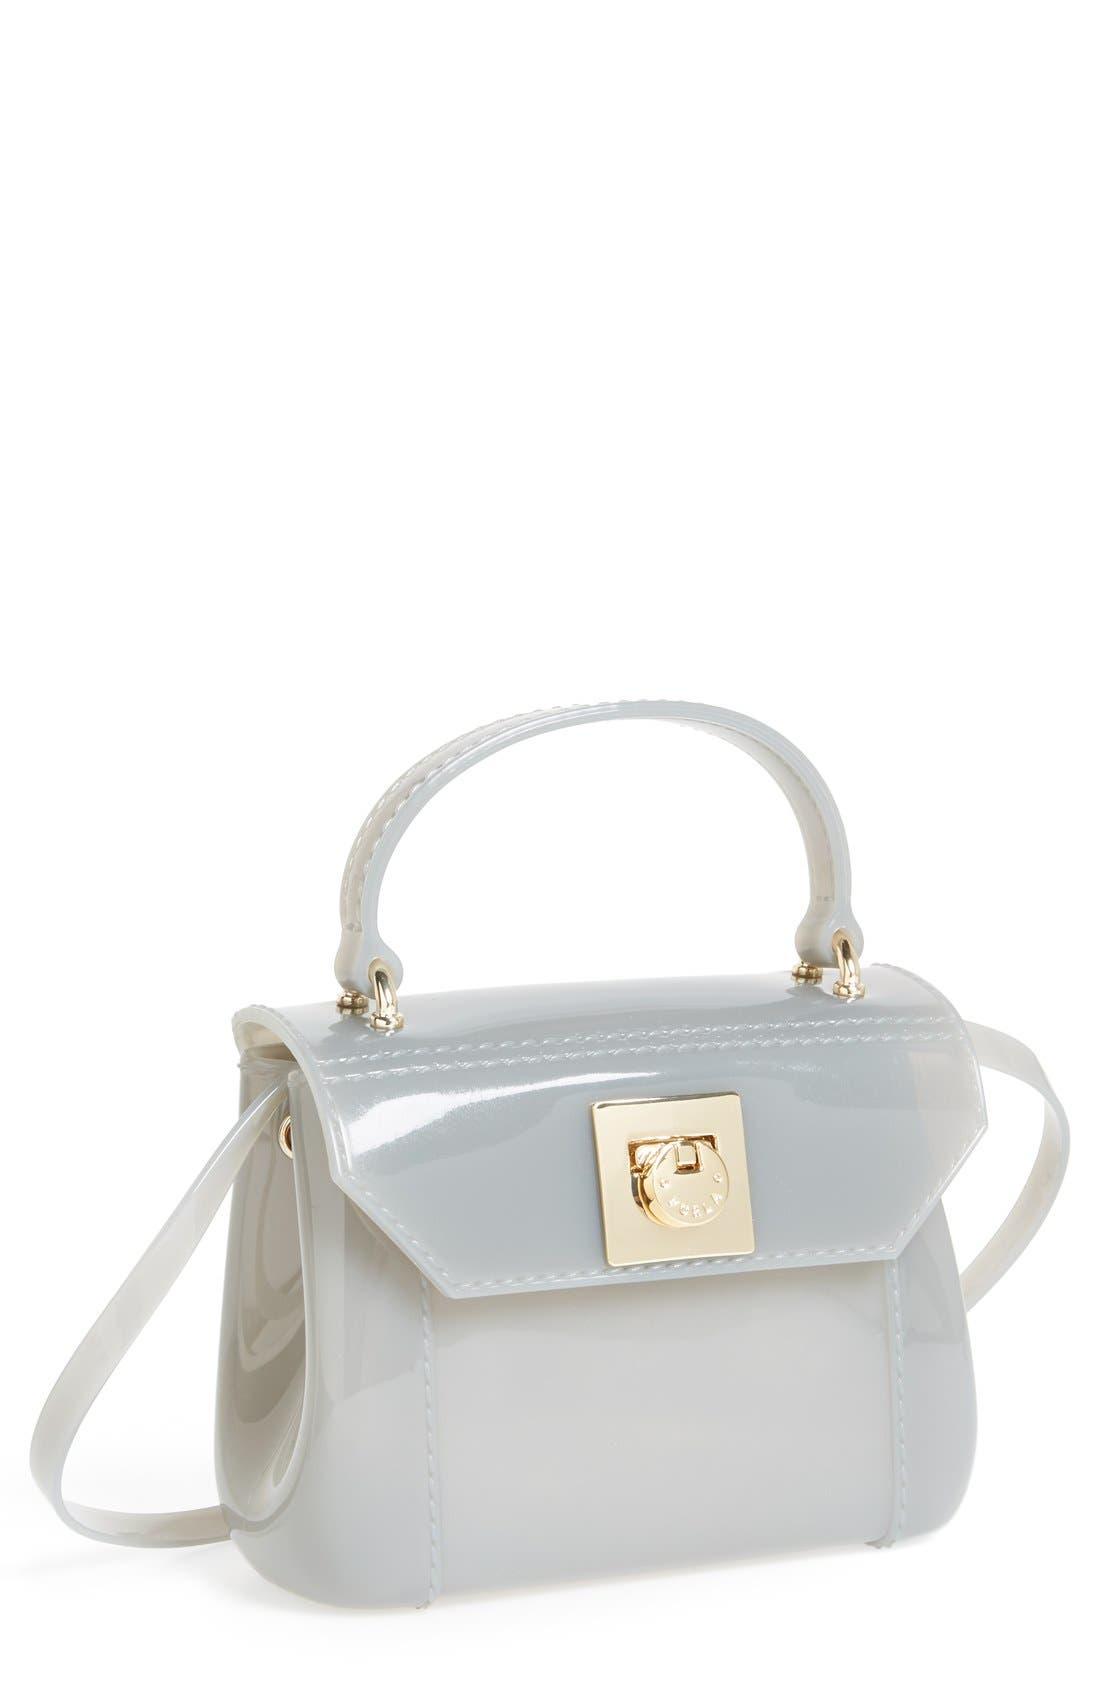 'Candy - Mini' Top Handle Crossbody Bag,                         Main,                         color, 020